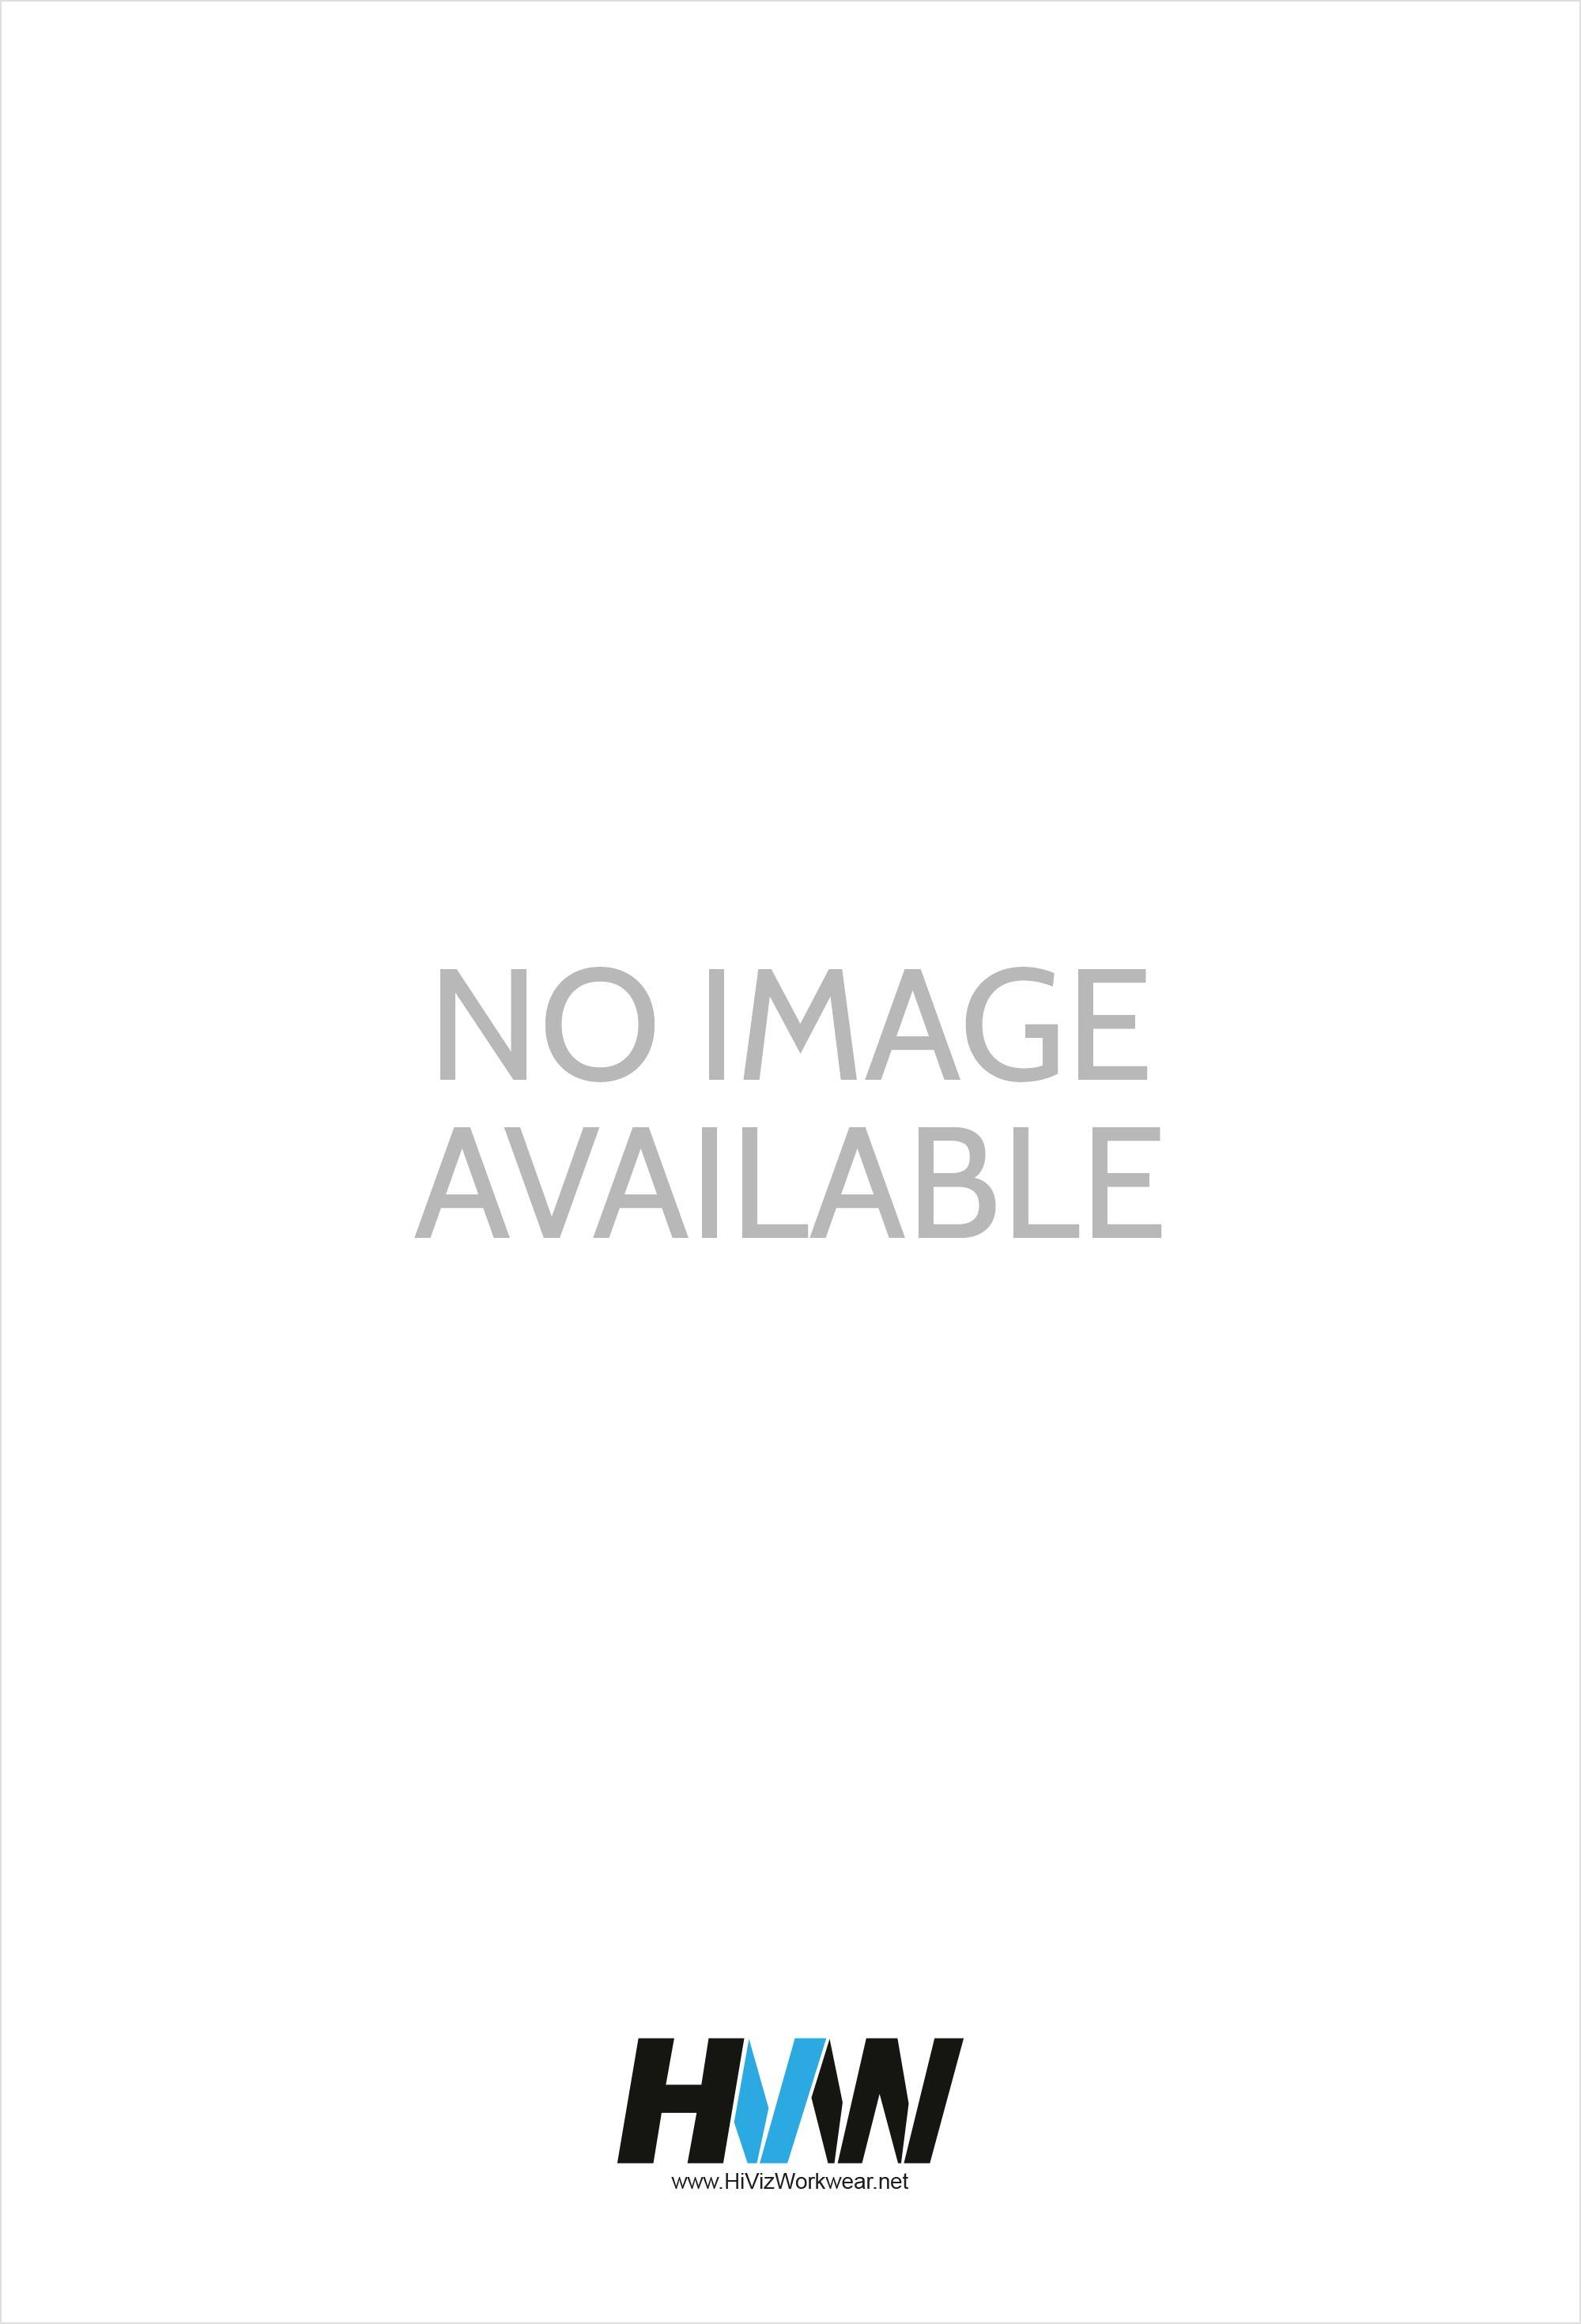 PR234 Signature Oxford Long Sleeve Shirt  (Collar Size 14.5 To 19.0)